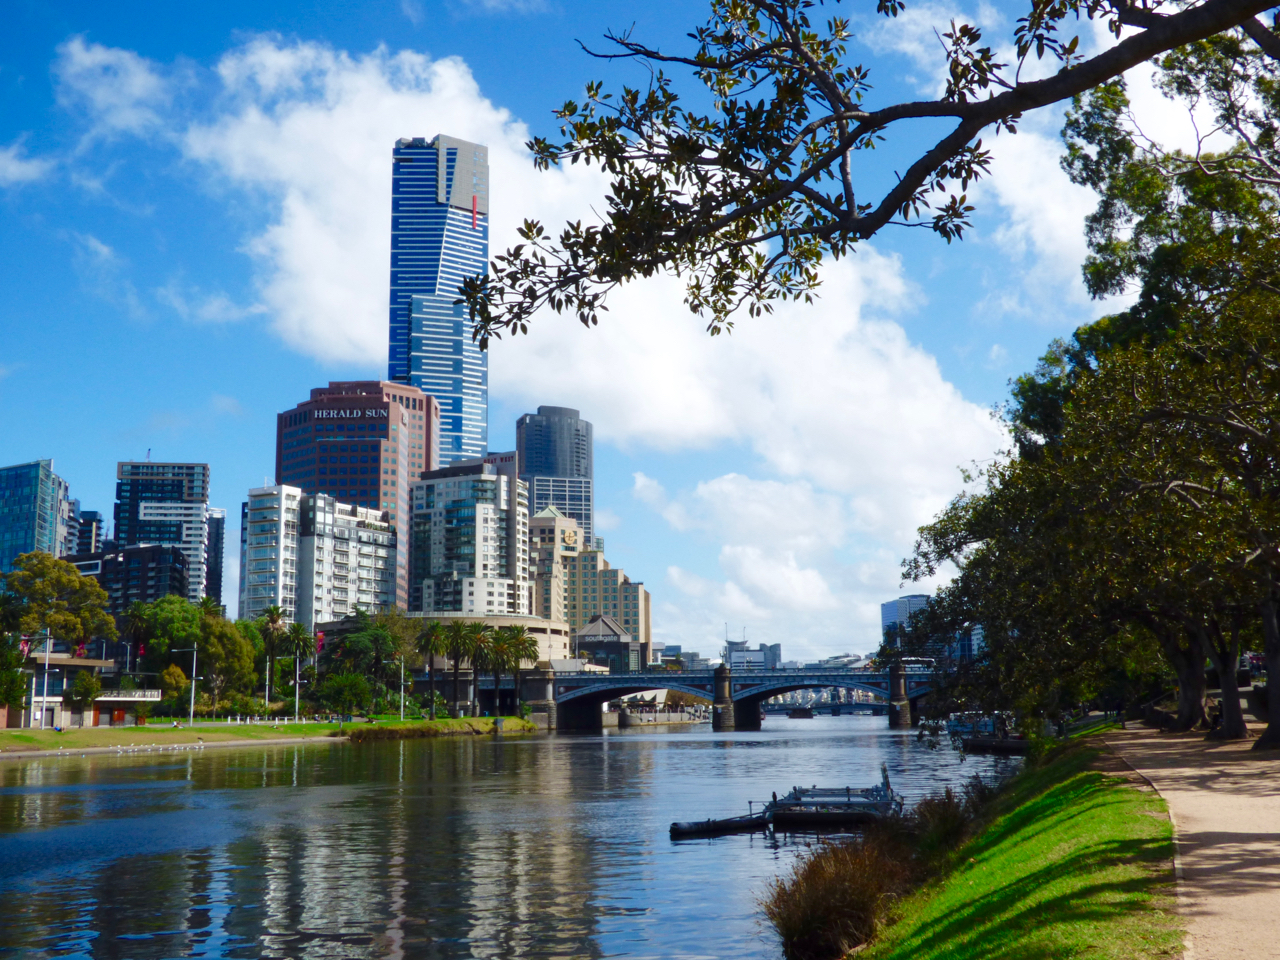 Melbourne, Australia Yarra River